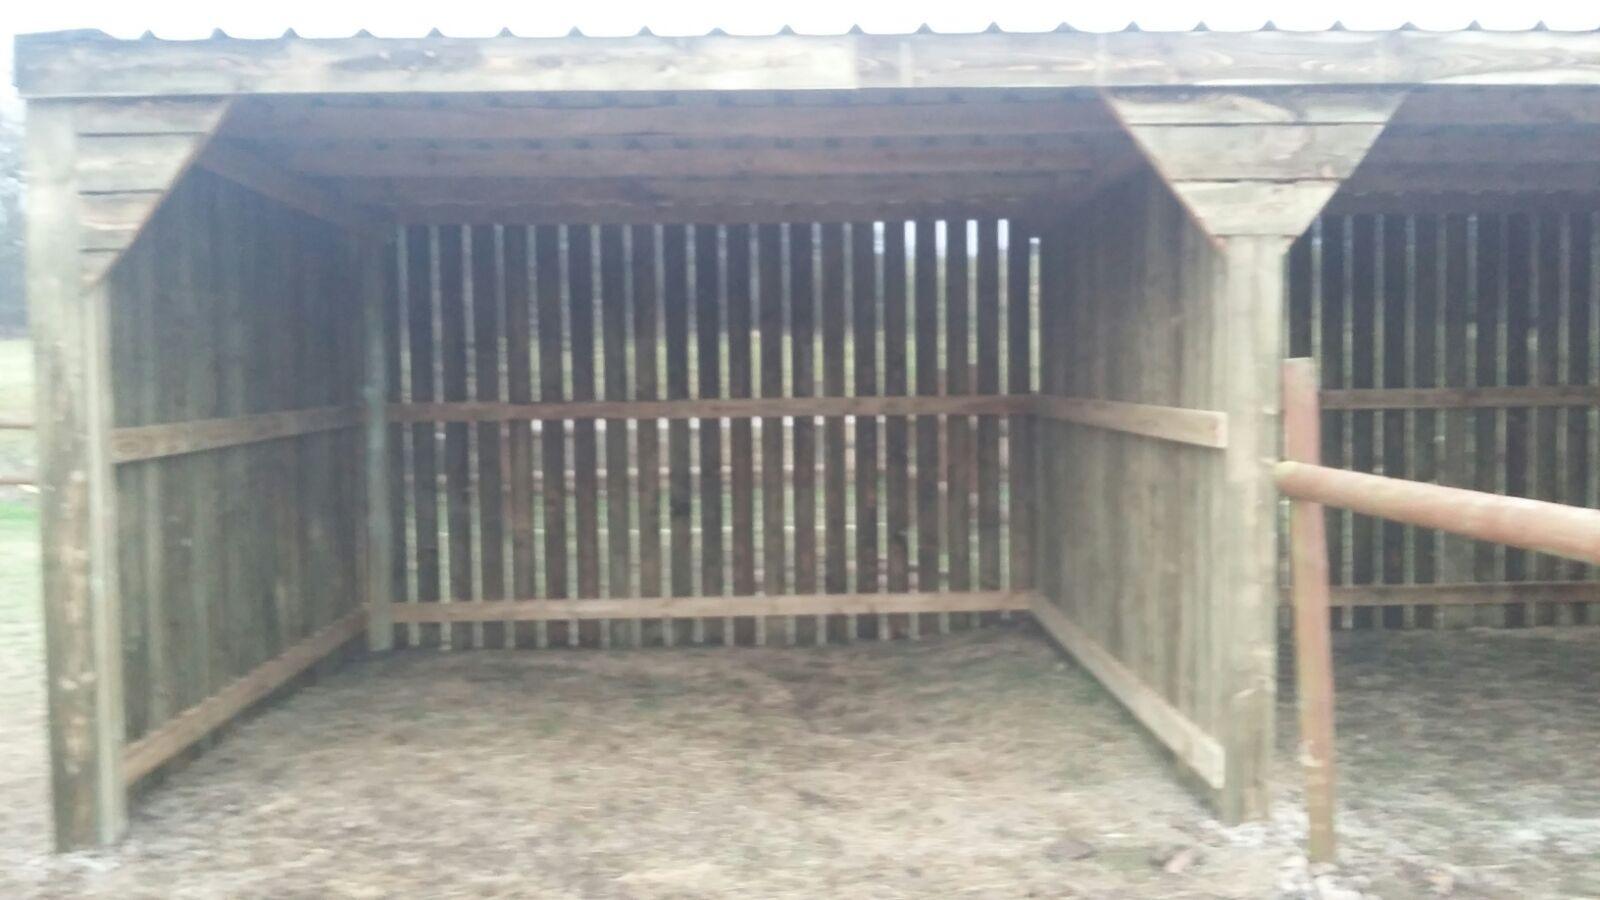 Equestrian Horse Shelter inside